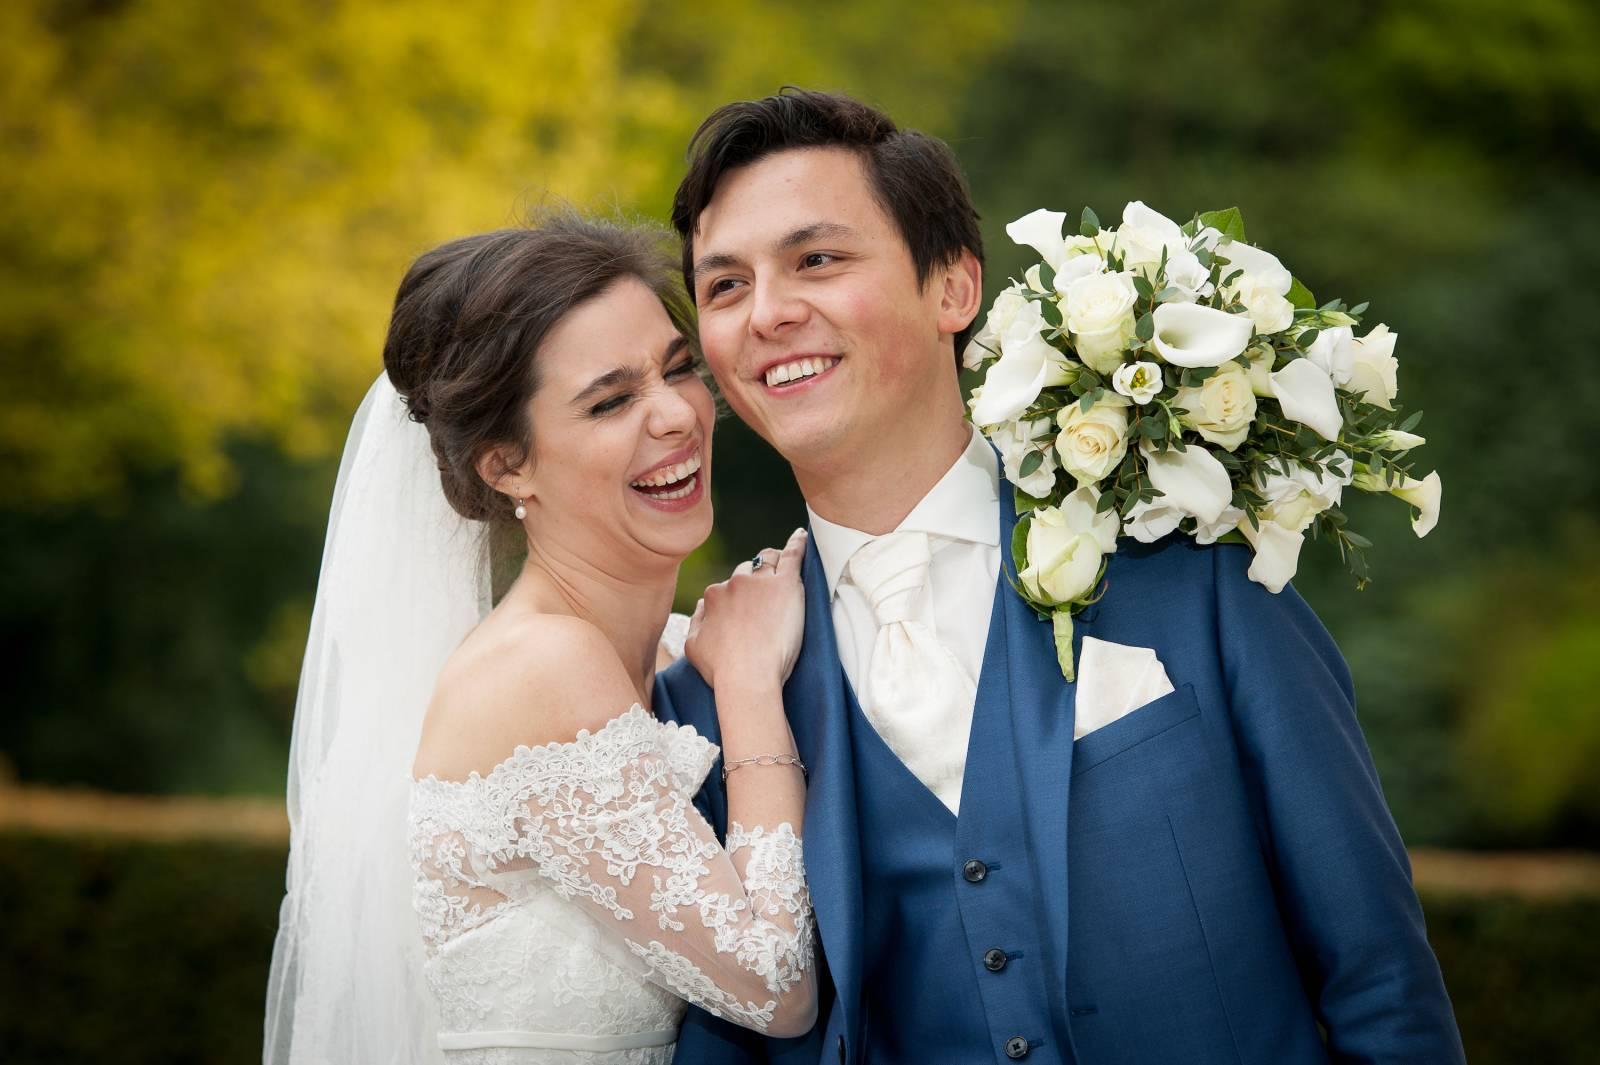 Foto Meeuw - House of Weddings - 28